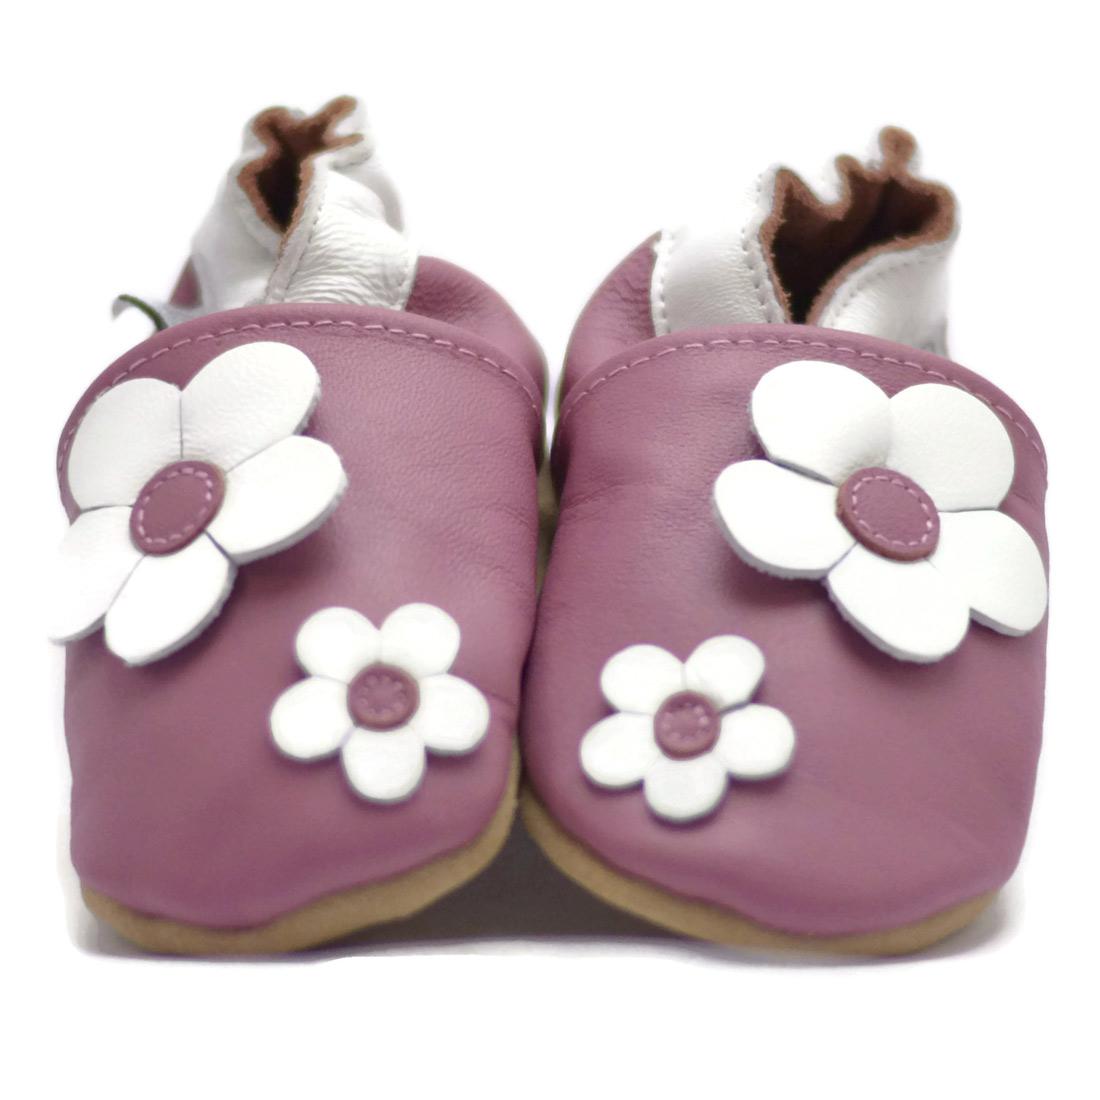 Pink flower shoes panda feet pink flower shoes pink flower shoes 2 mightylinksfo